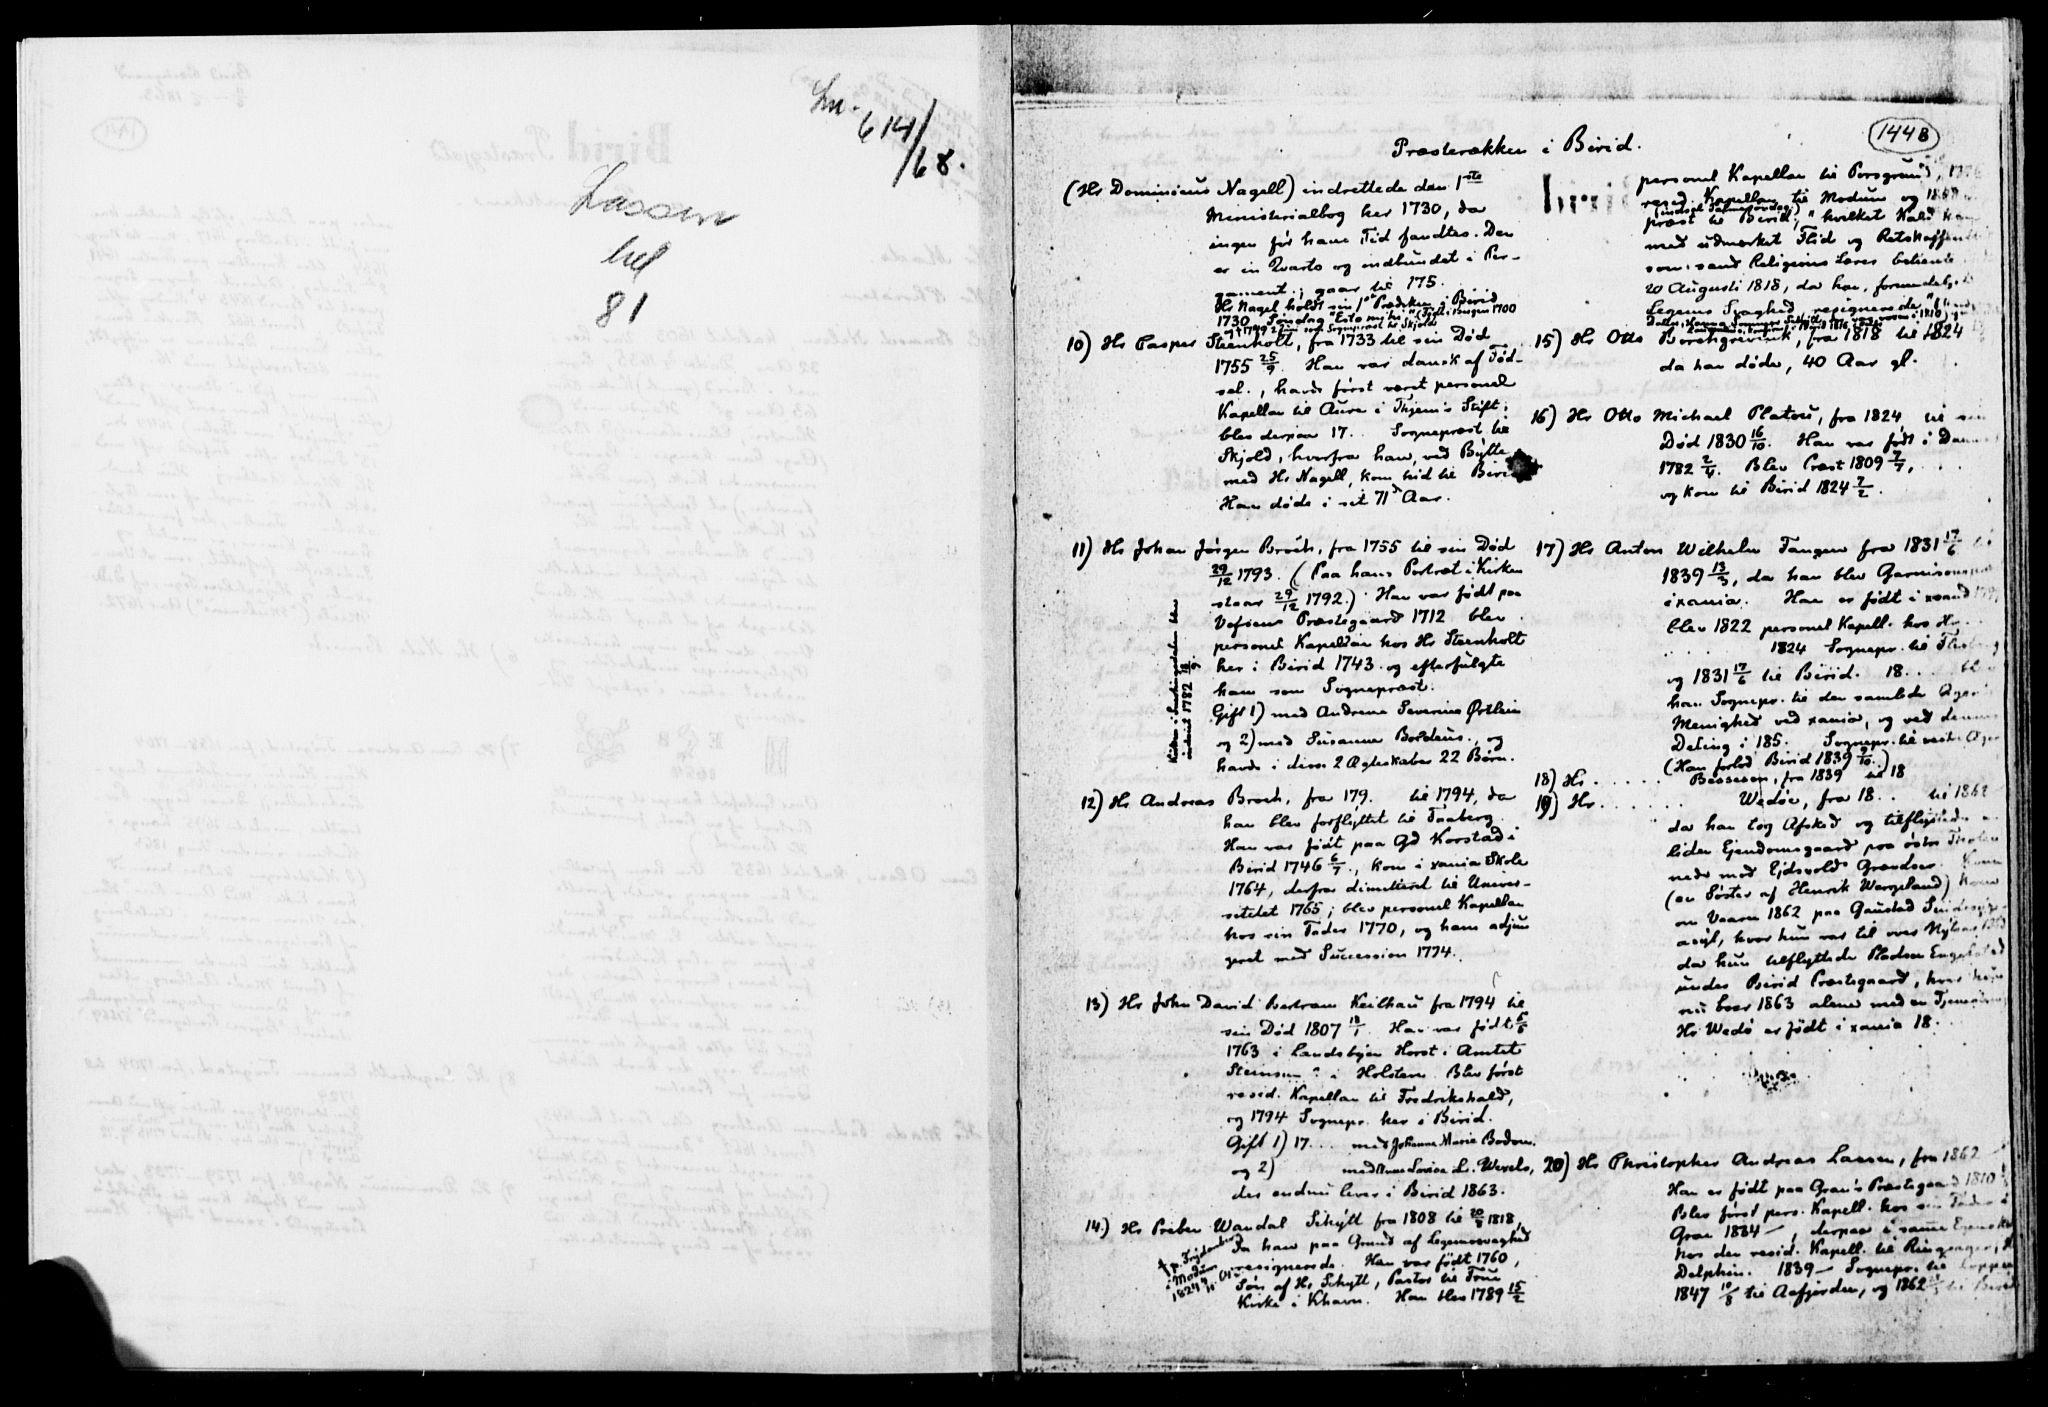 SAH, Biri prestekontor, Ministerialbok, 1730-1879, s. 144b